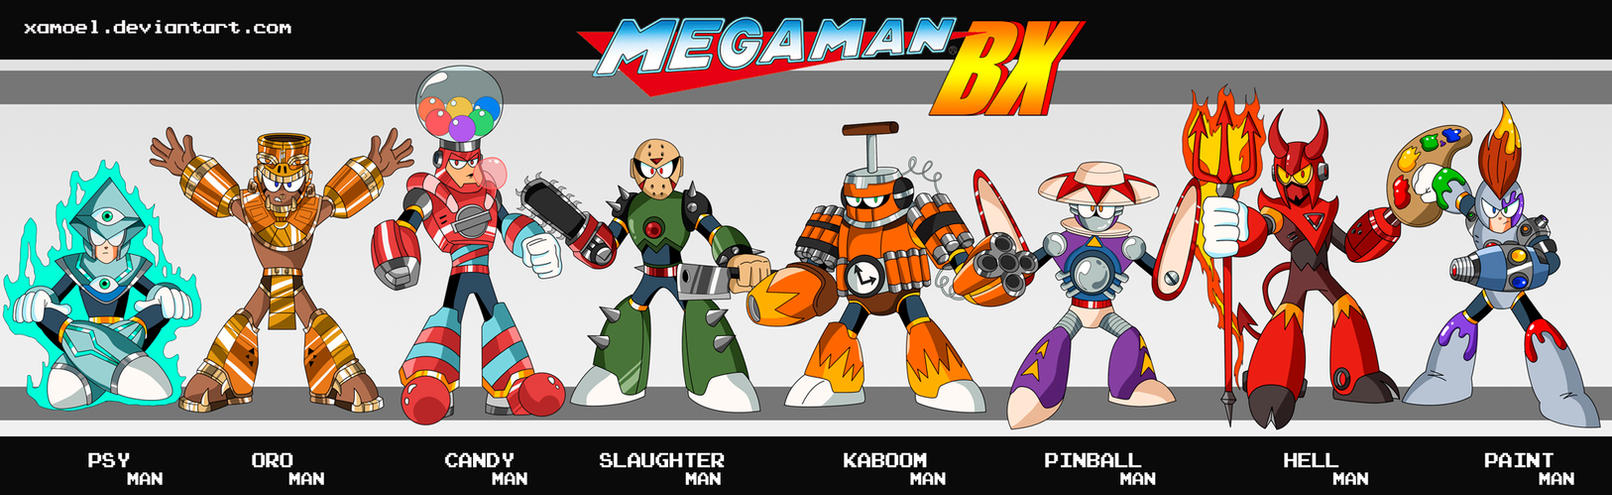 MEGAMAN BX ROBOT MASTERS by XAMOEL